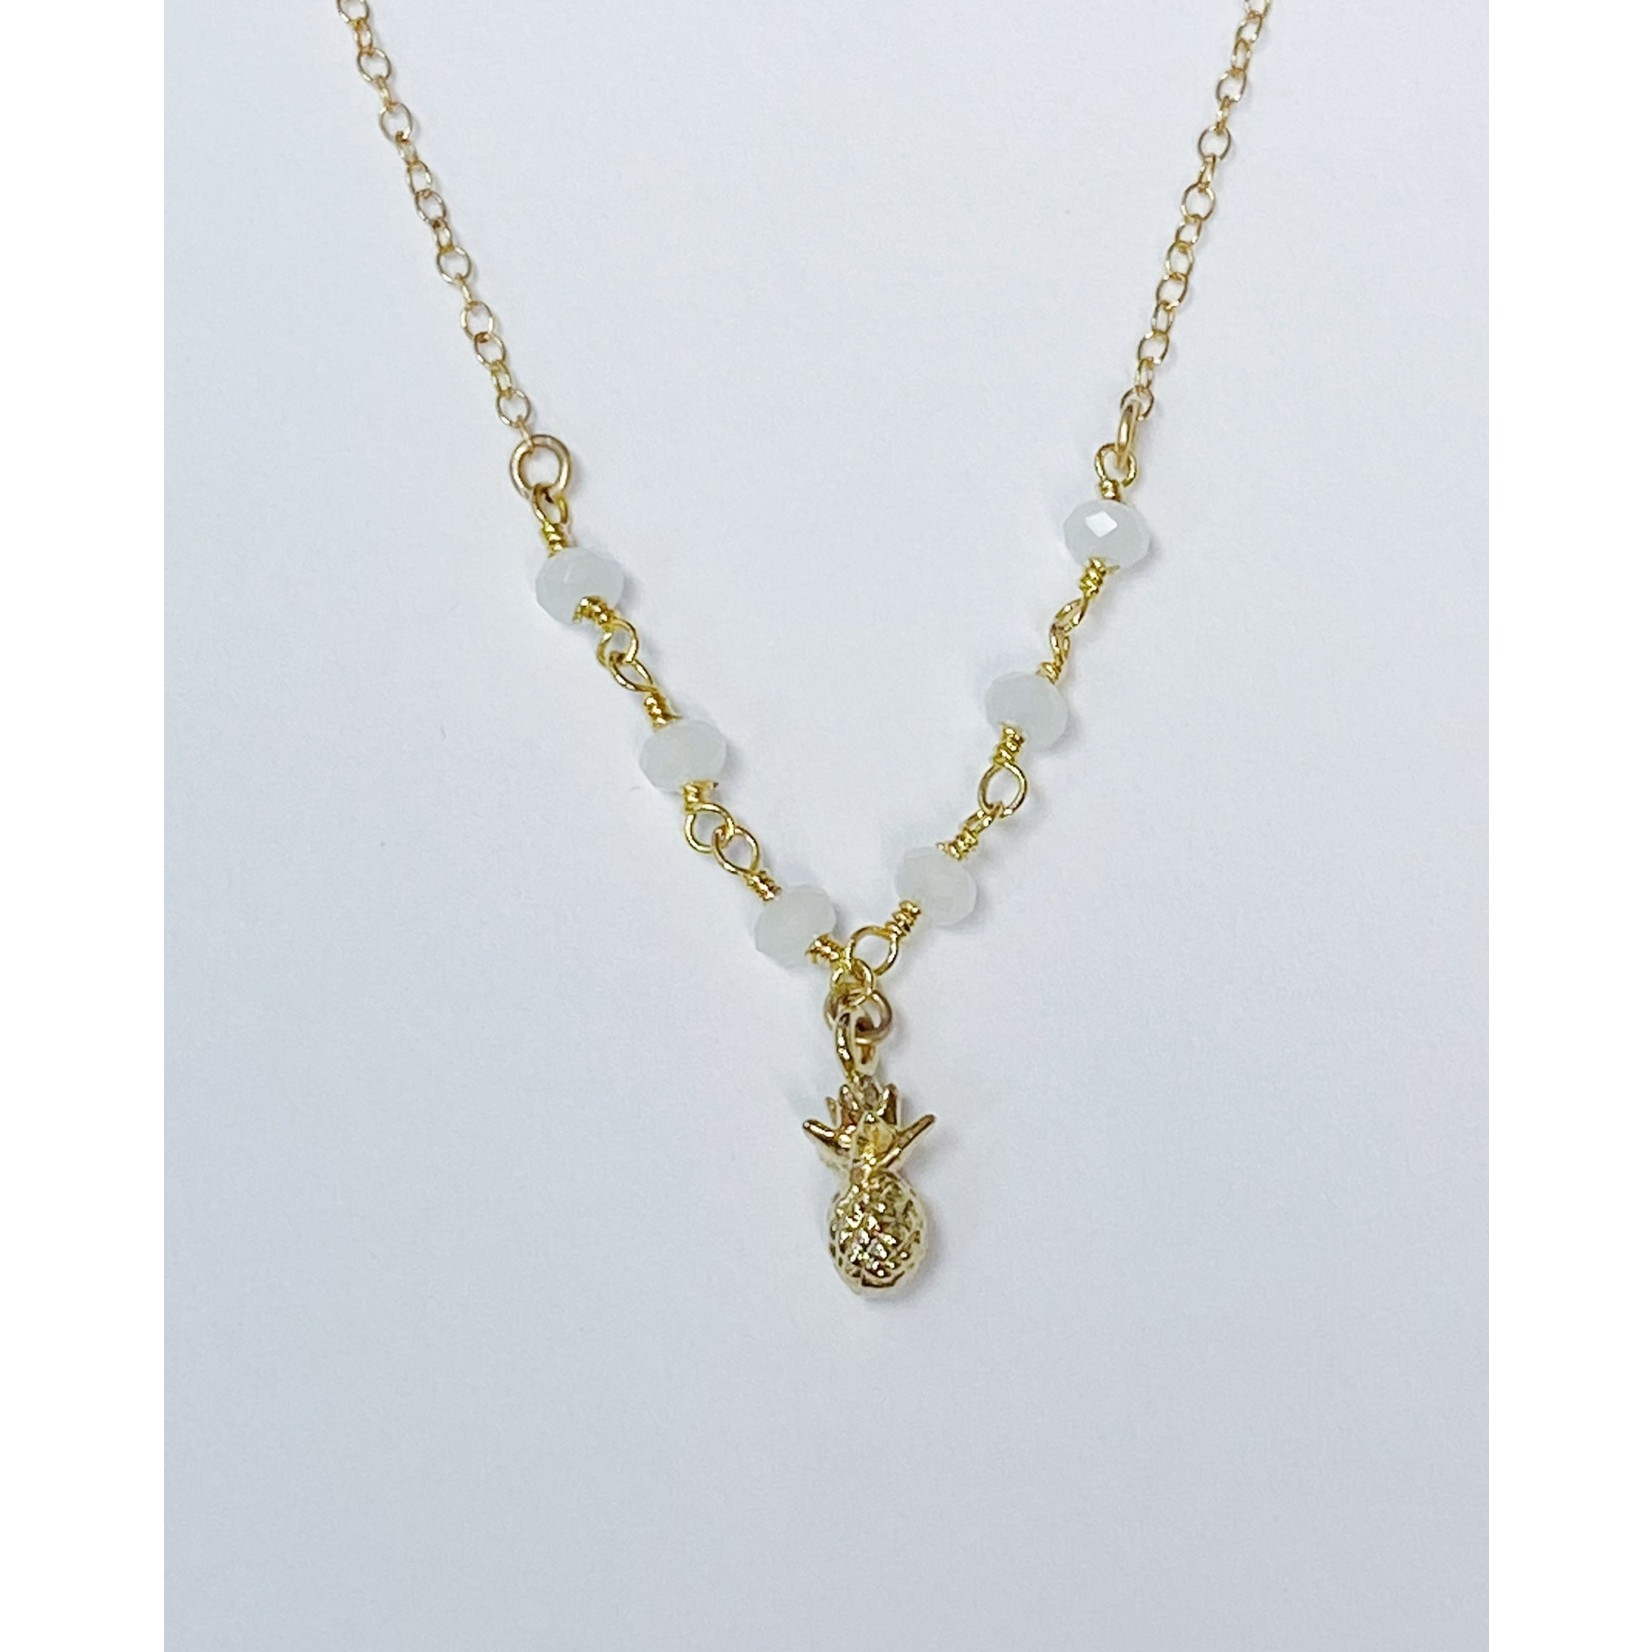 Komakai Jewelry Sydney Necklace - GF, White Chalcedony, 18k gold plated pineapple